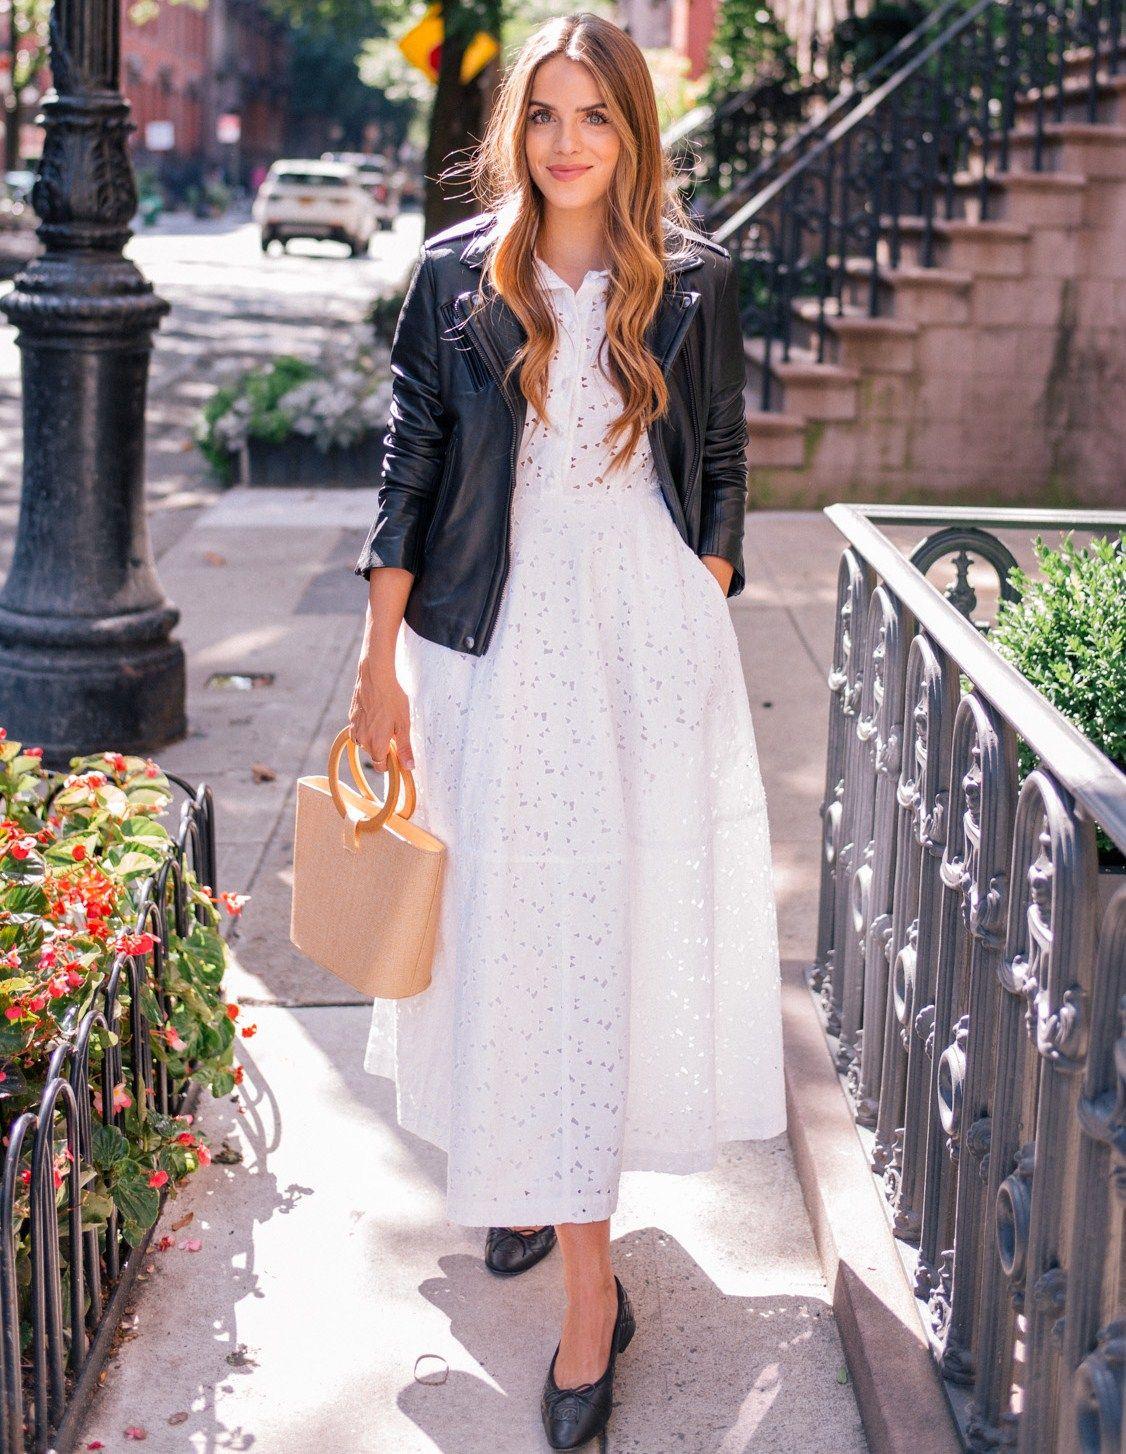 10 17 Wearing Summer Dresses Into Fall Iro Leather Jacket Co Short Sleeve Tea Length Eyelet Dress Chanel Fl Iro Leather Jacket Summer Dresses Eyelet Dress [ 1454 x 1126 Pixel ]